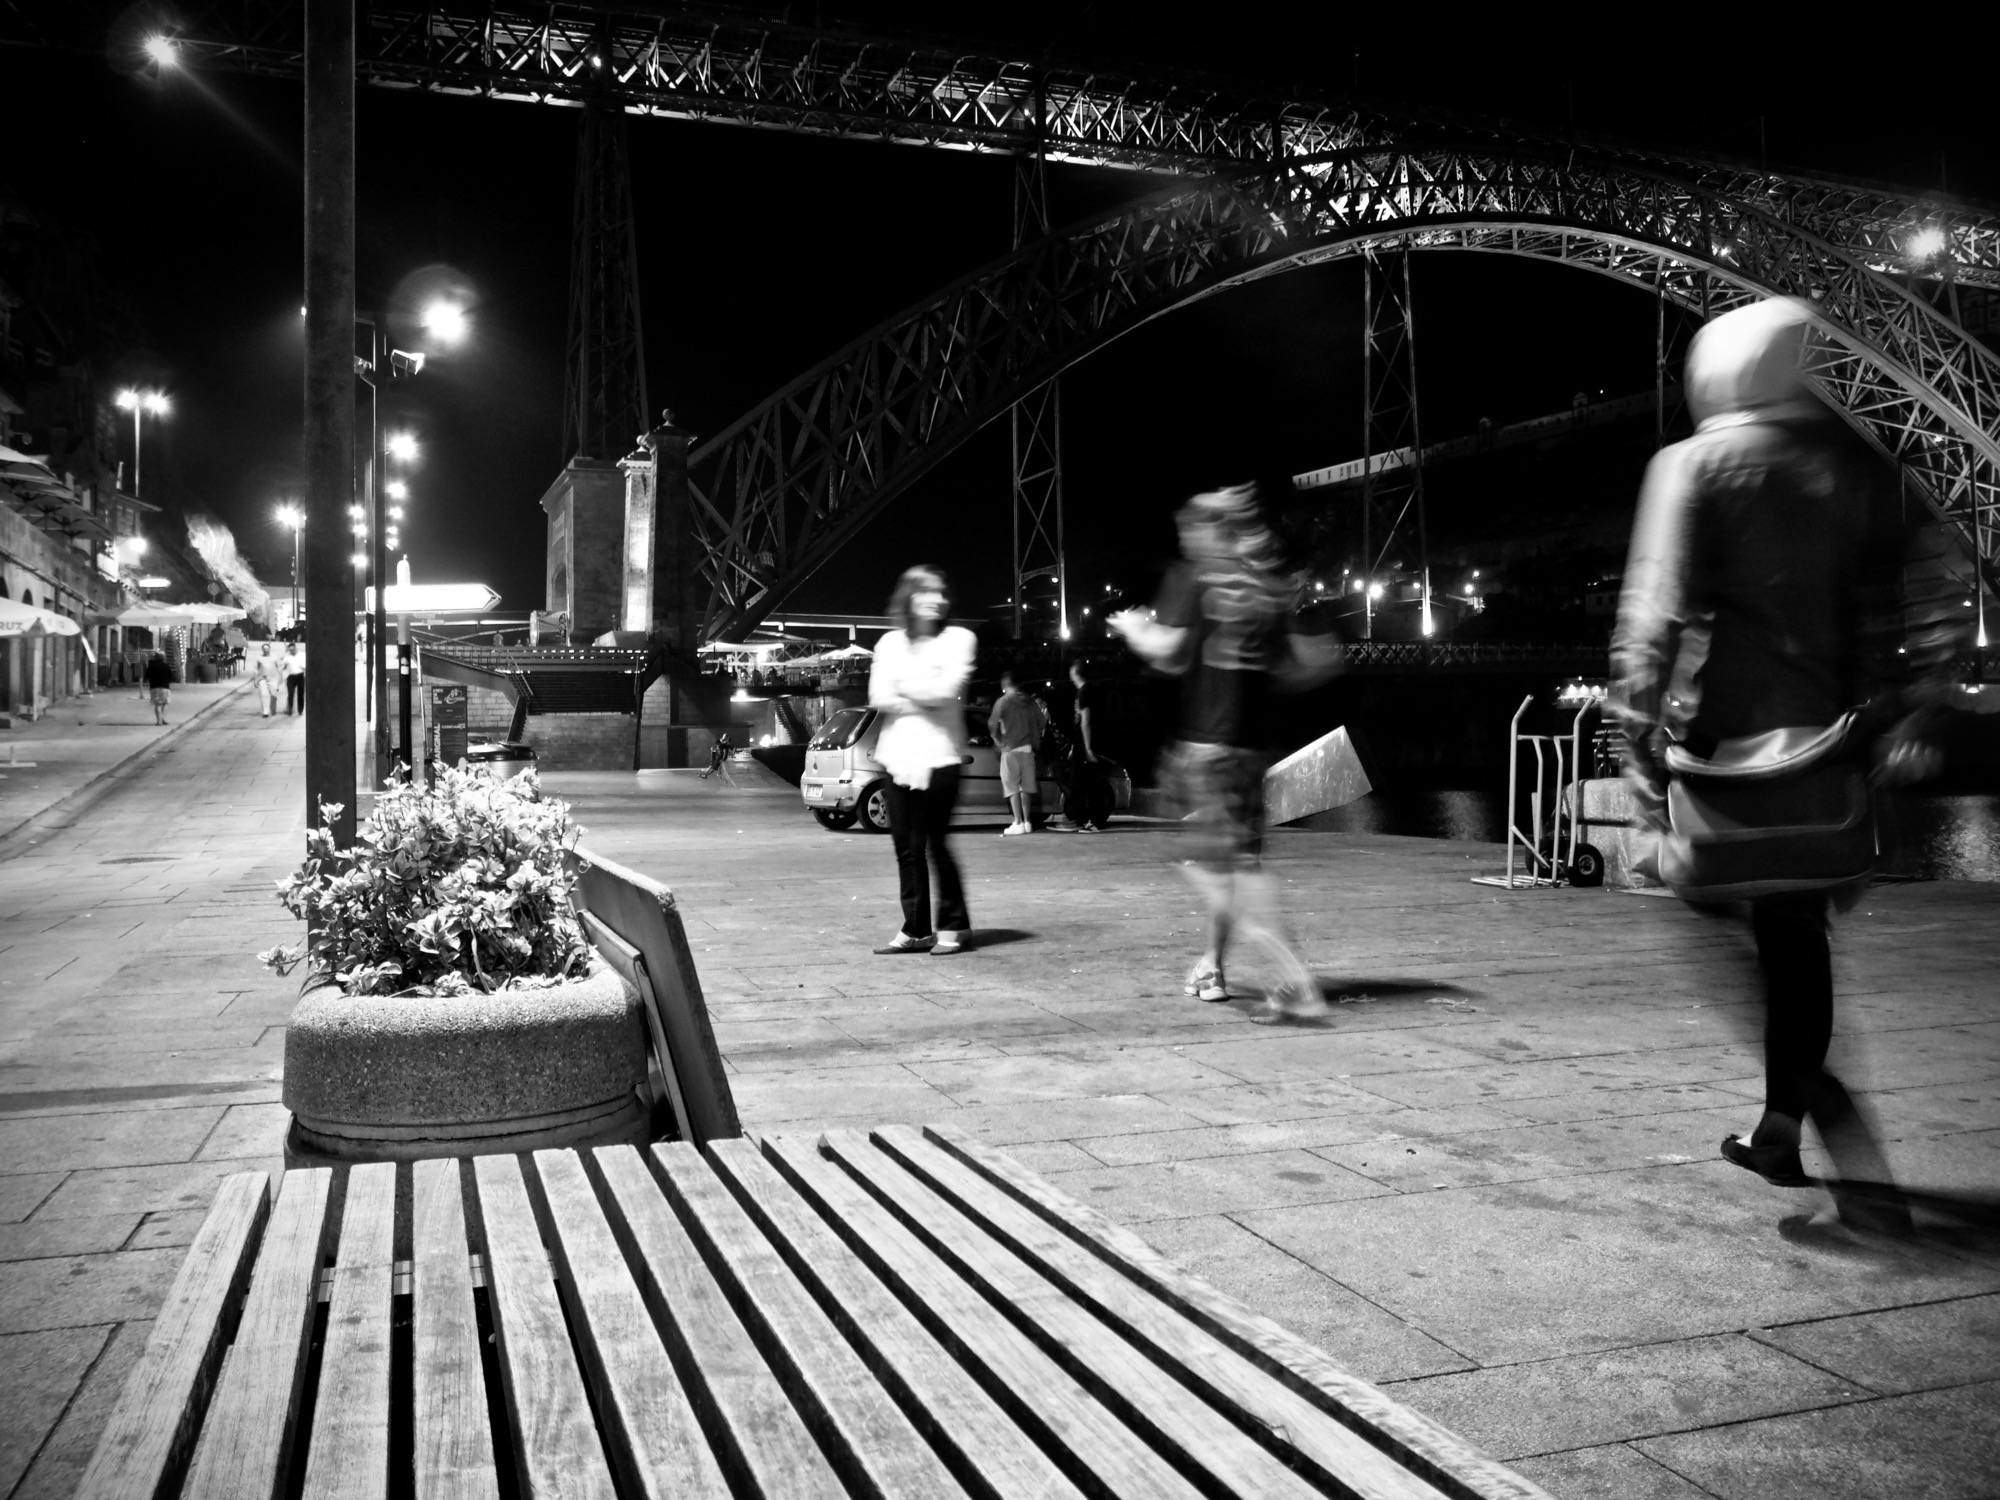 Ponte Dom Luis I _Massimiliano Scarpa photographer 2012